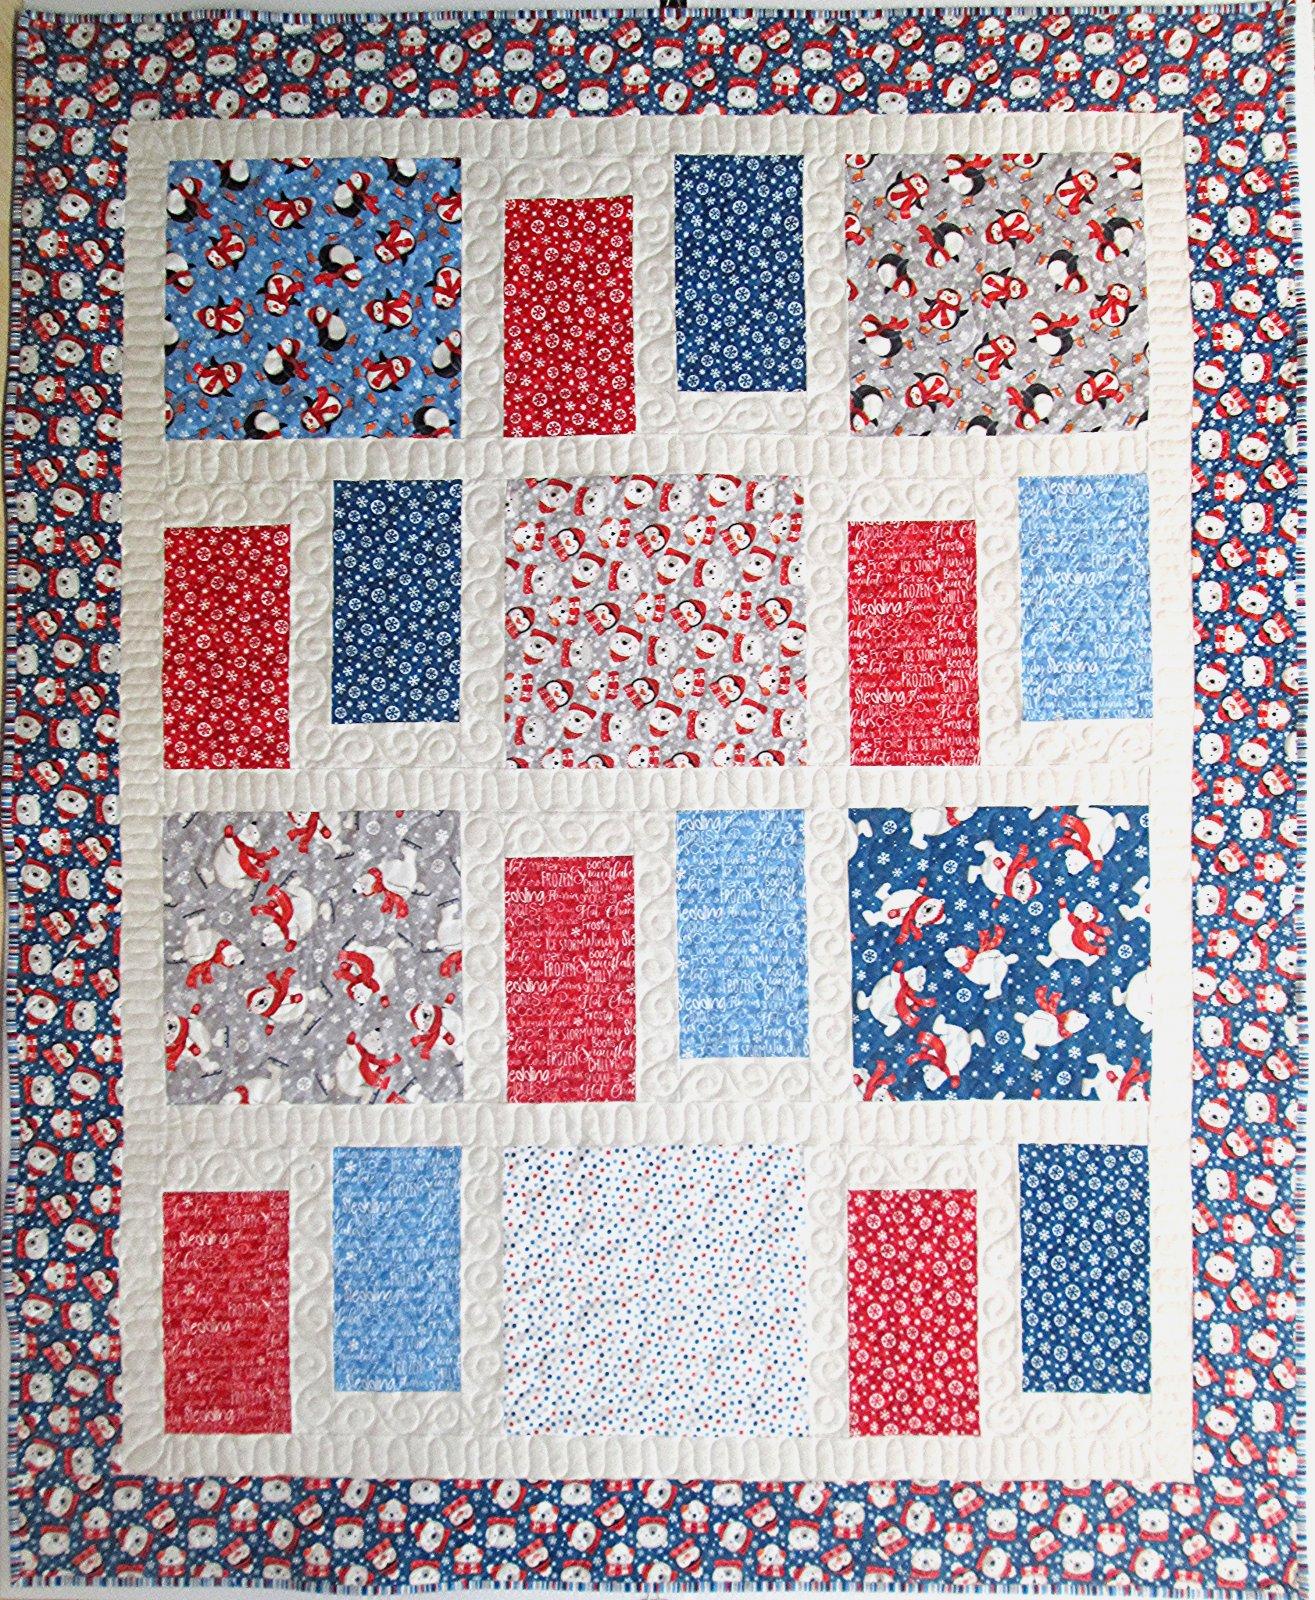 Below Zero Flannel Portals Quilt Kit 60 by 76